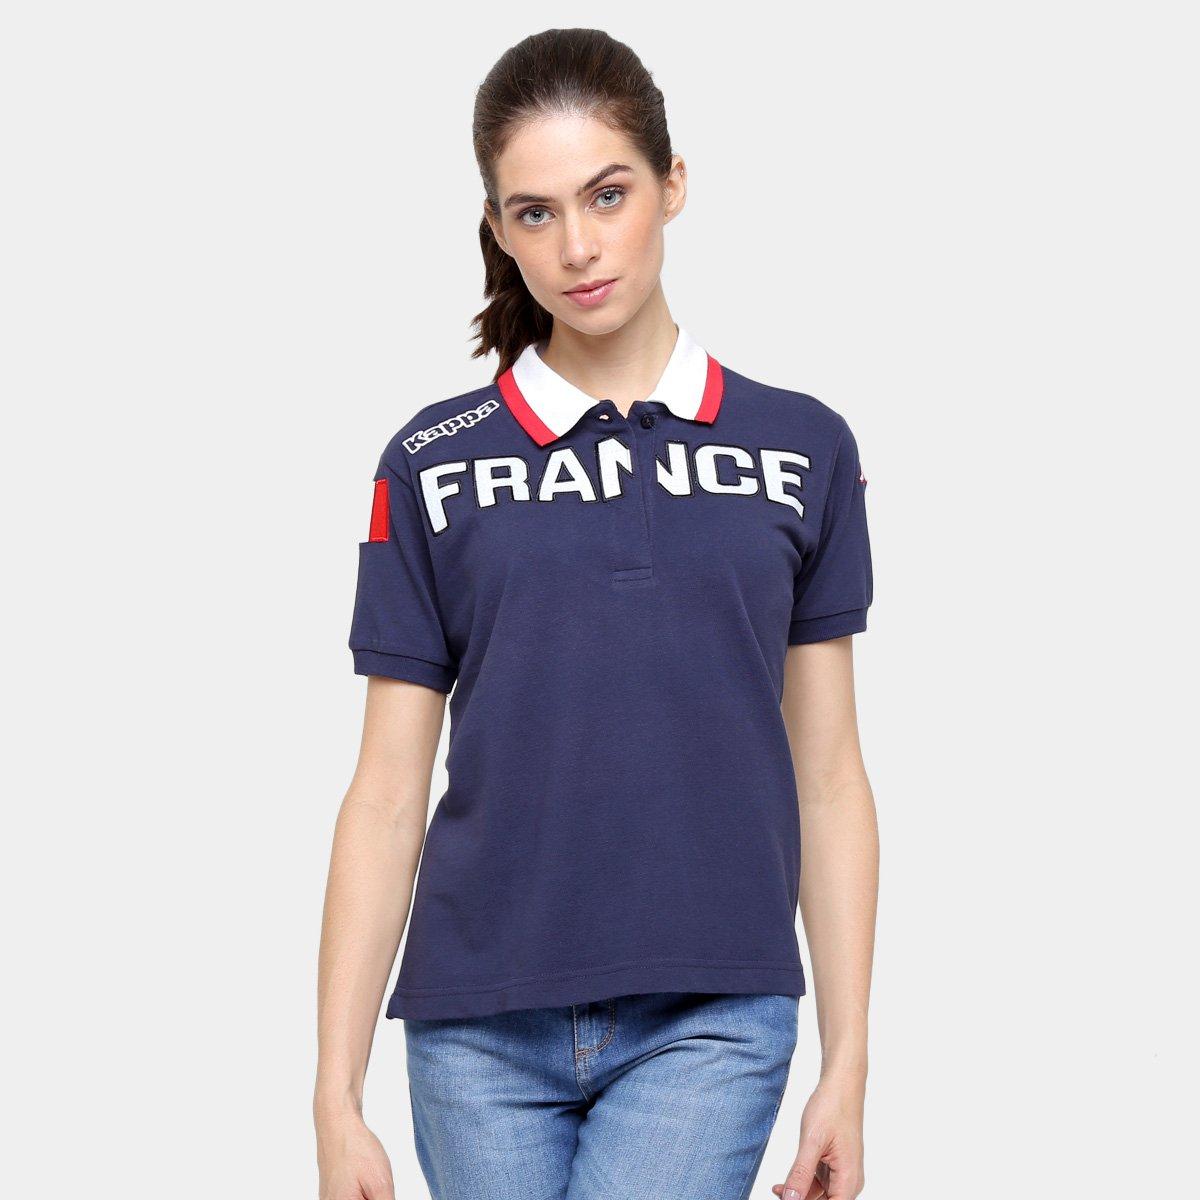 Camisa Polo Kappa Eroi Lady França - Compre Agora   Netshoes 3a64ae1f47